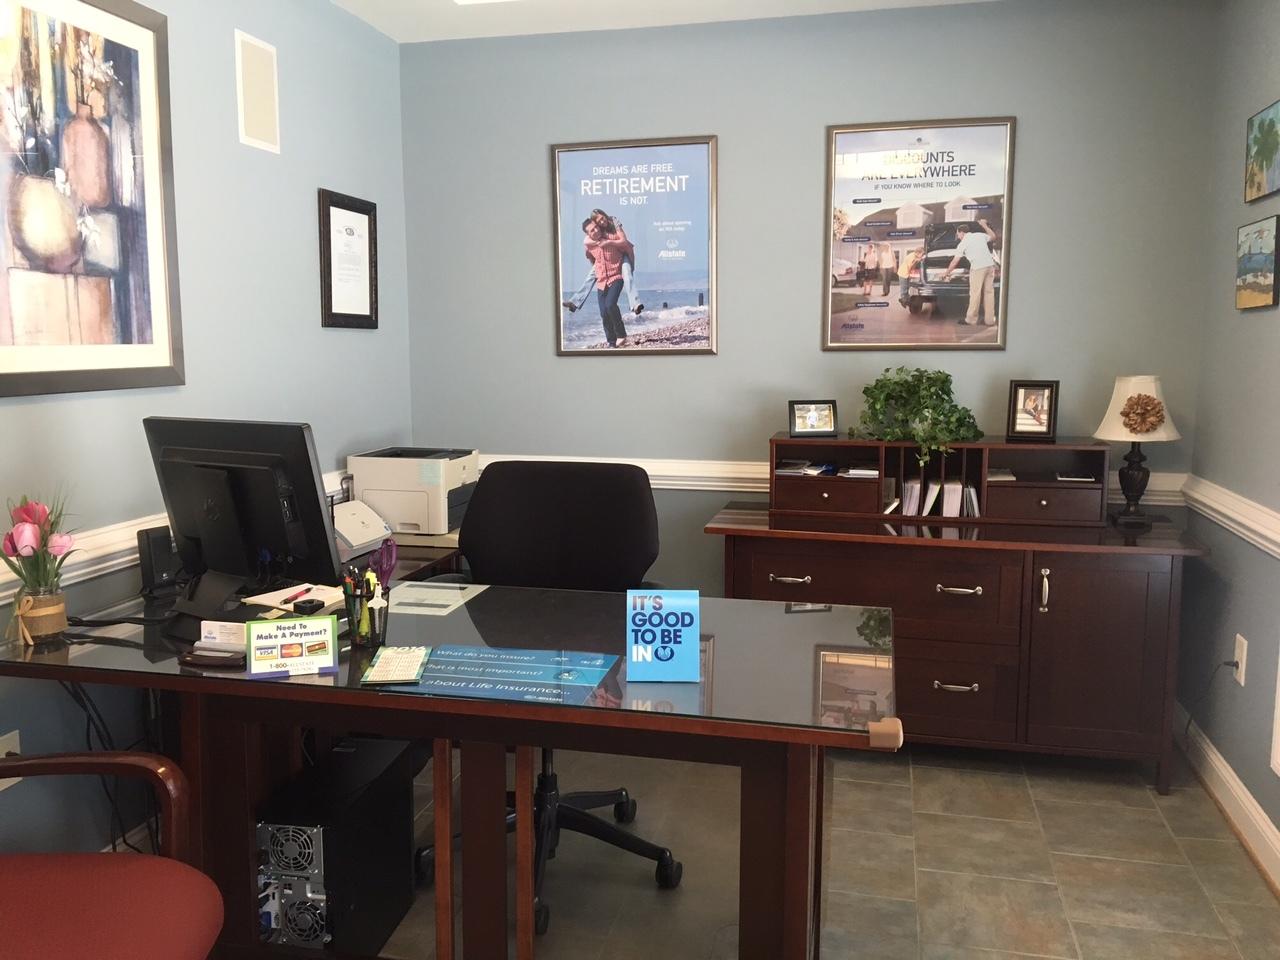 Barry F. Melvin: Allstate Insurance image 3